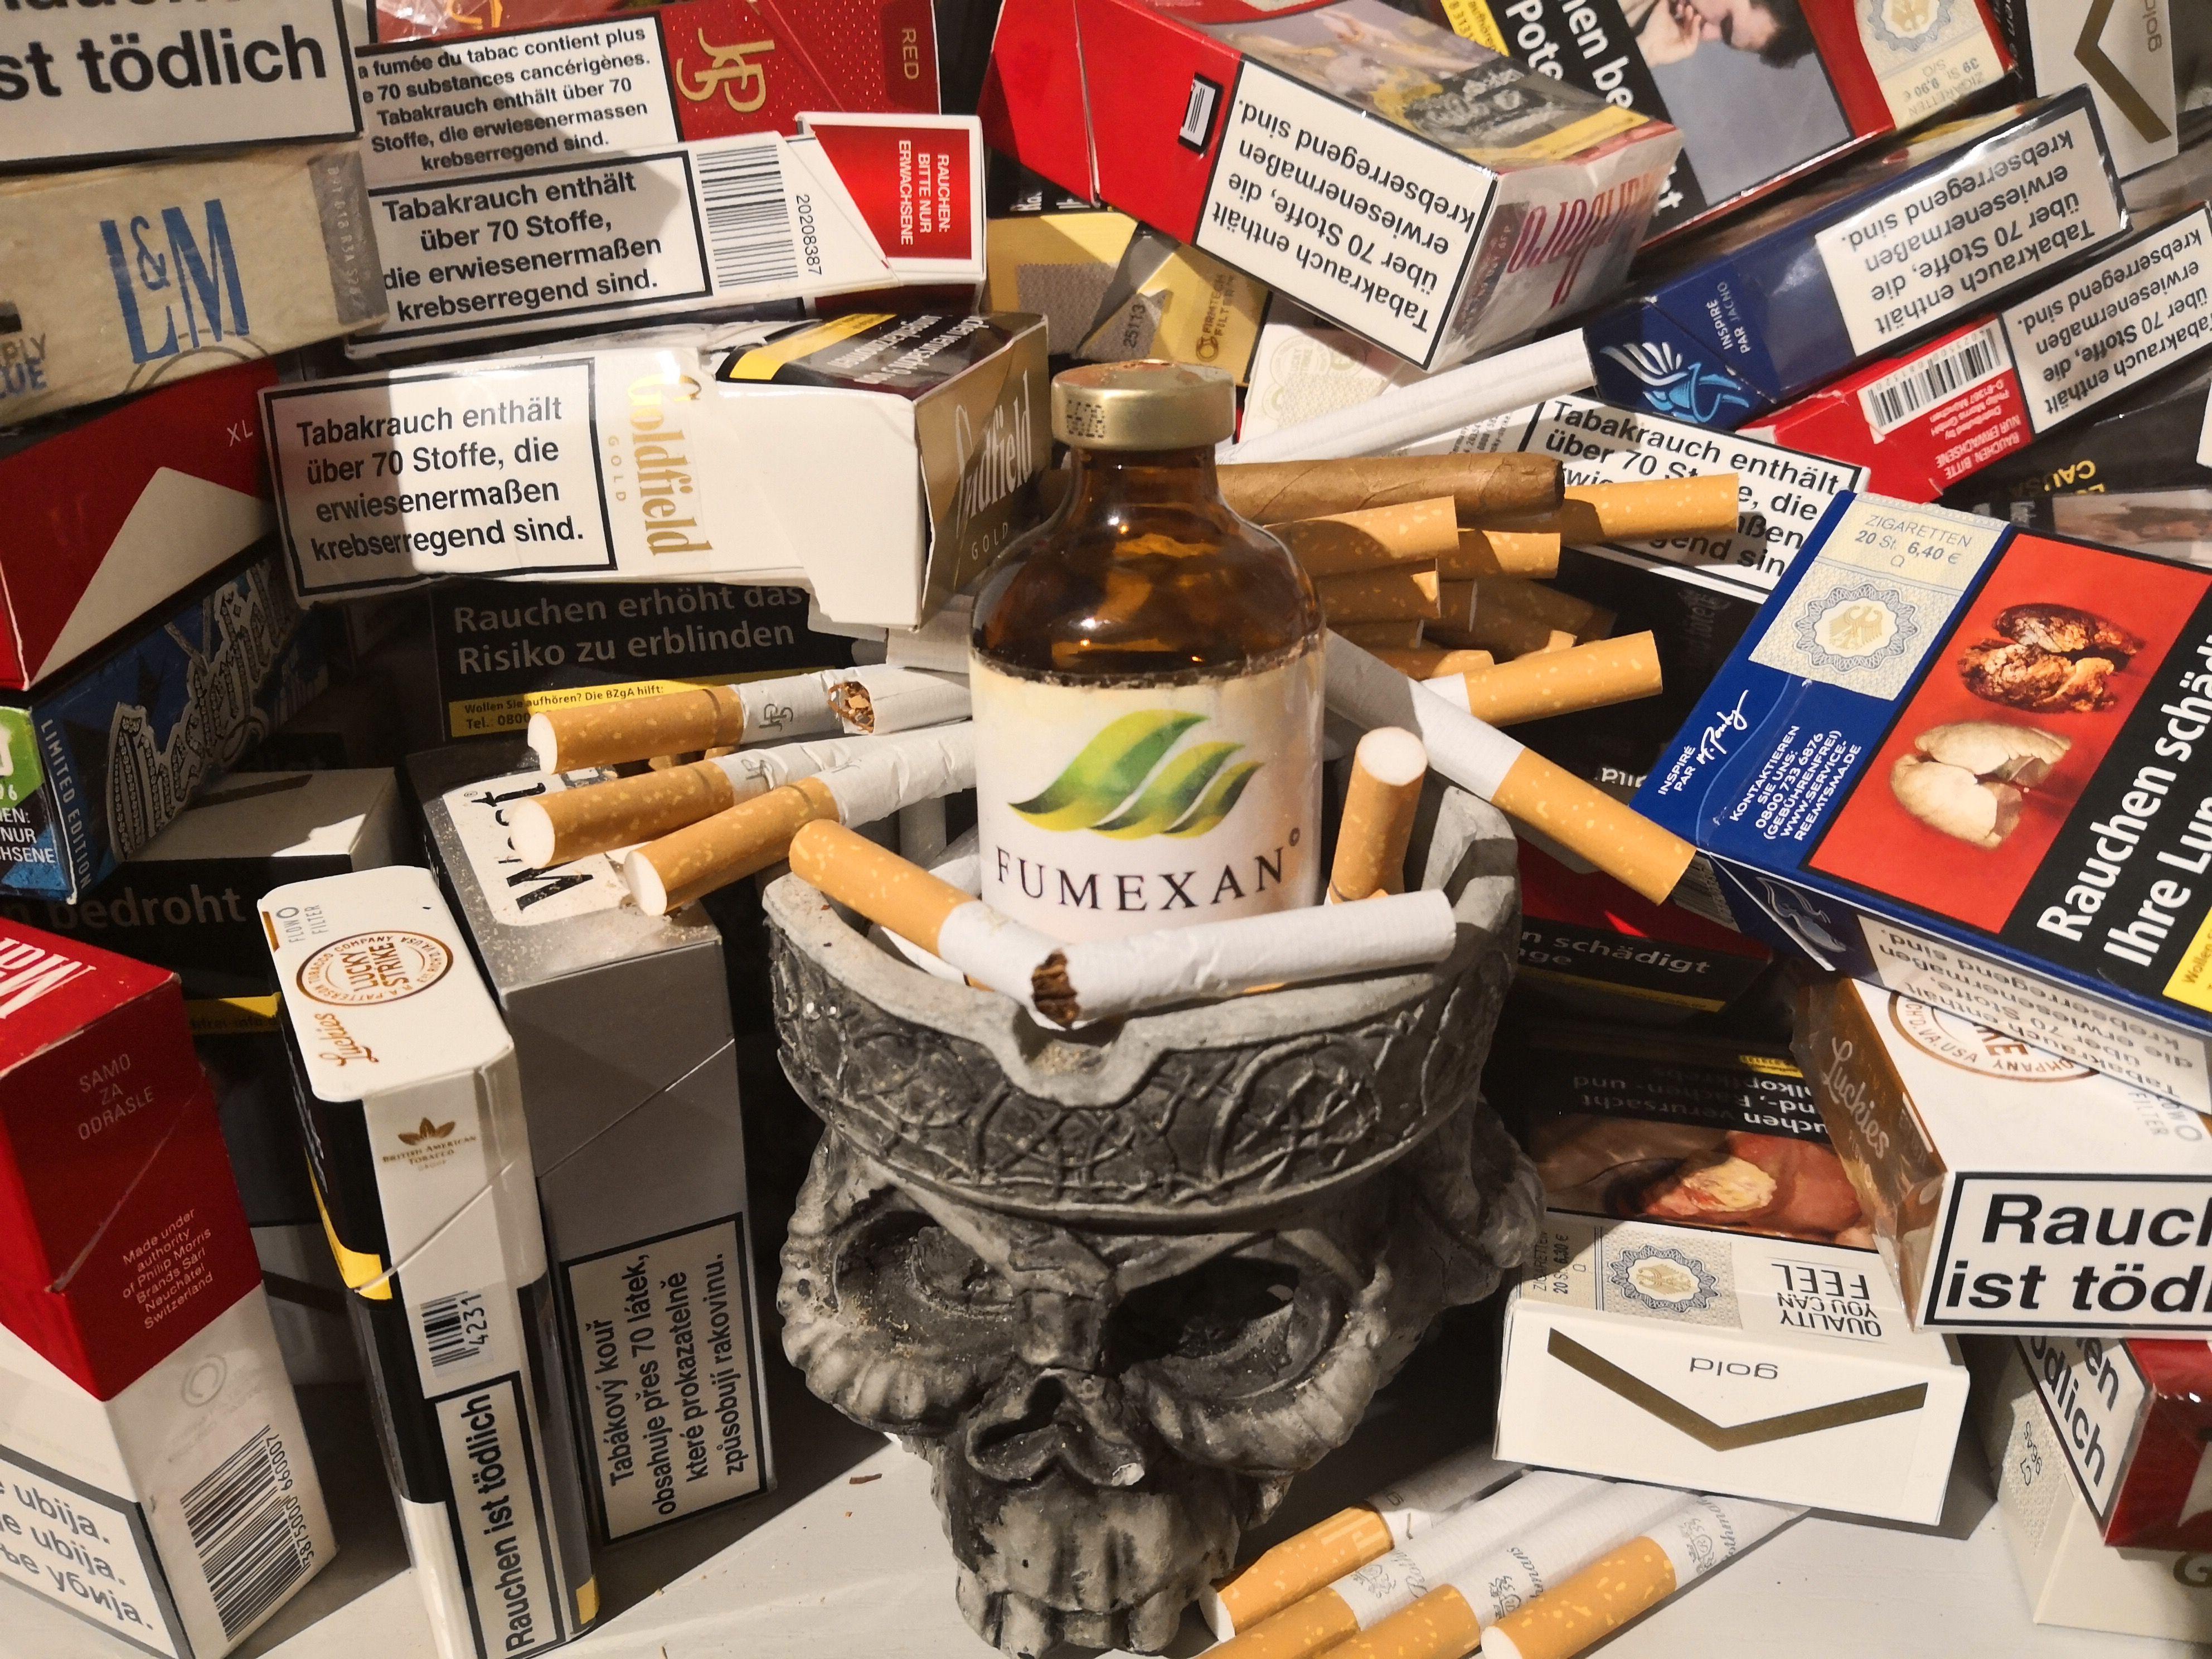 raucherentwöhnung saarland